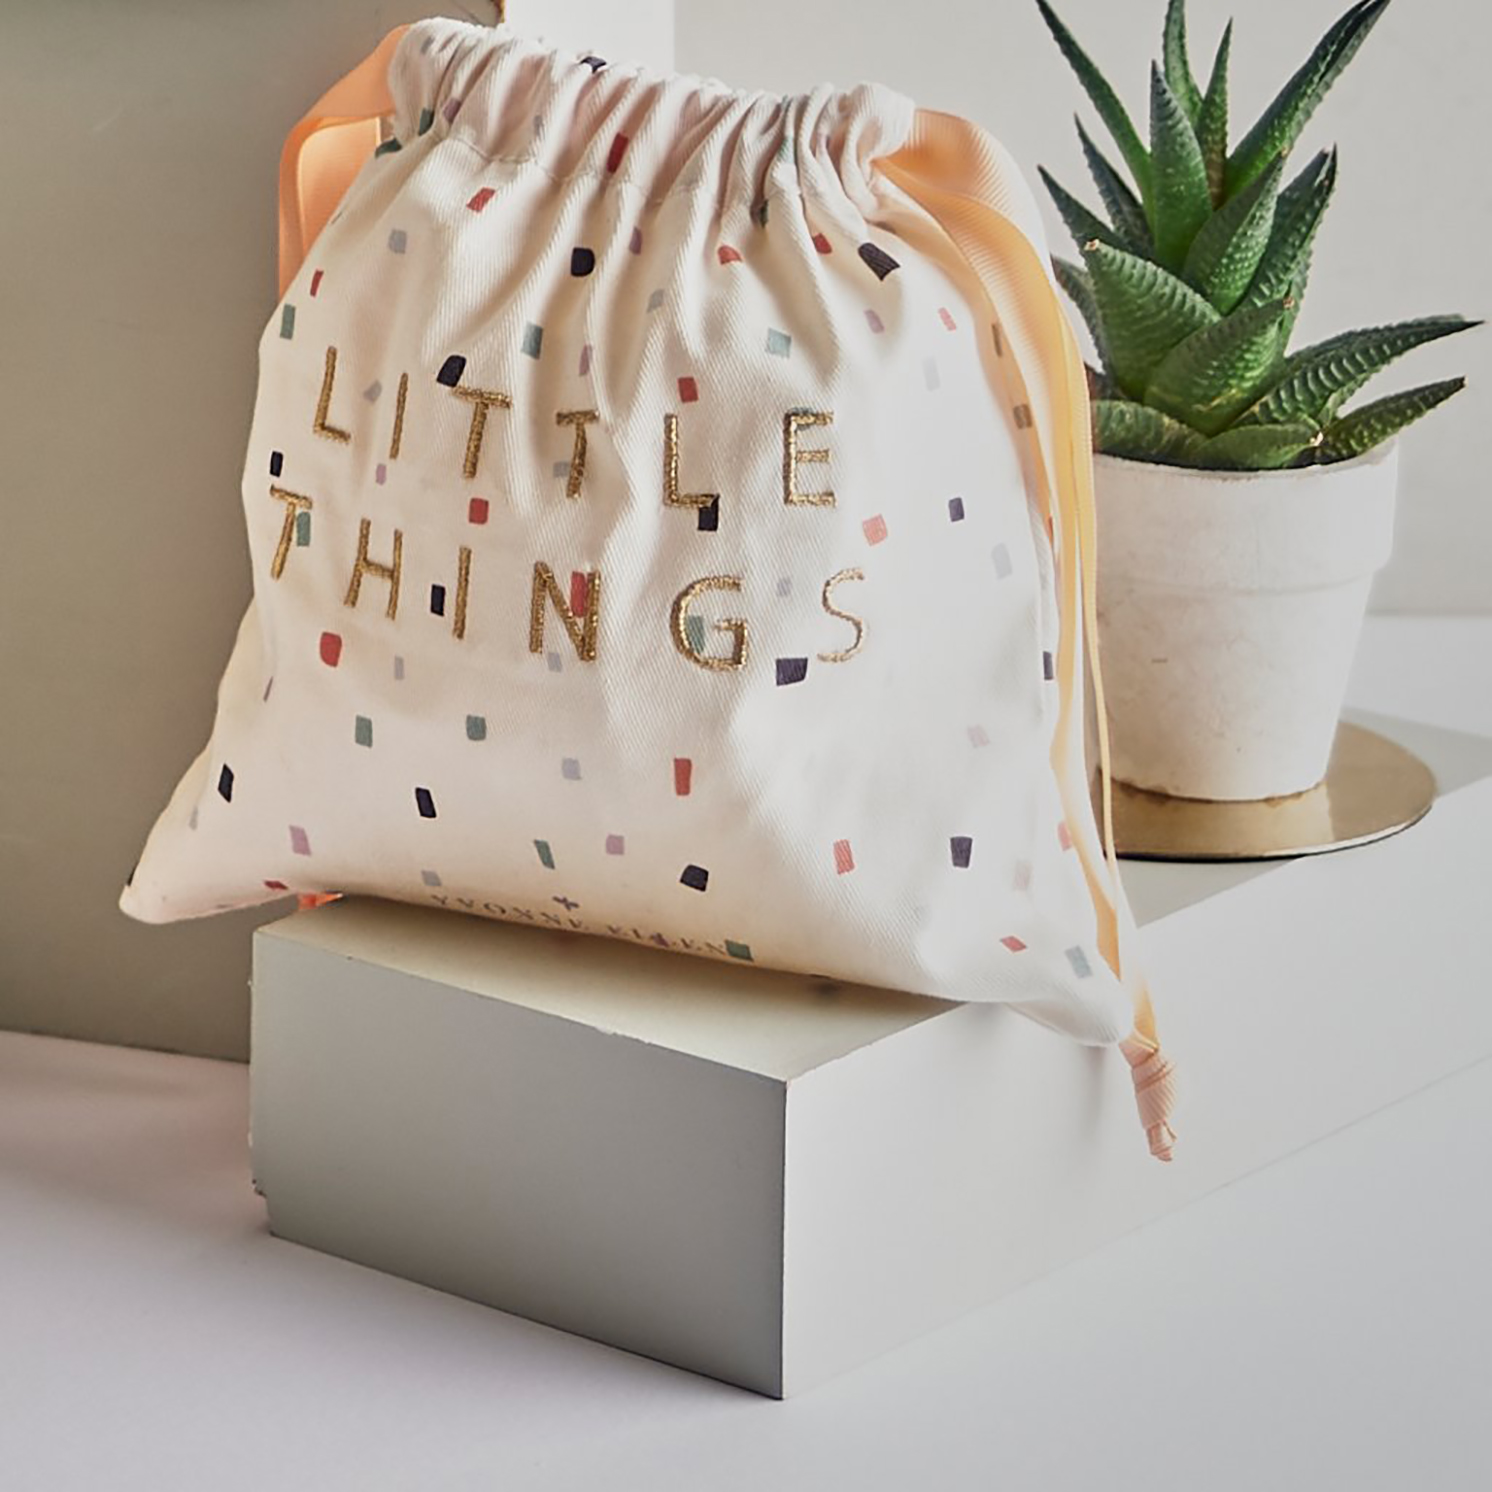 Yvonne Ellen – Cheeky Cheetah & Cockatoo 3 Piece Cotton Bag Travel Set